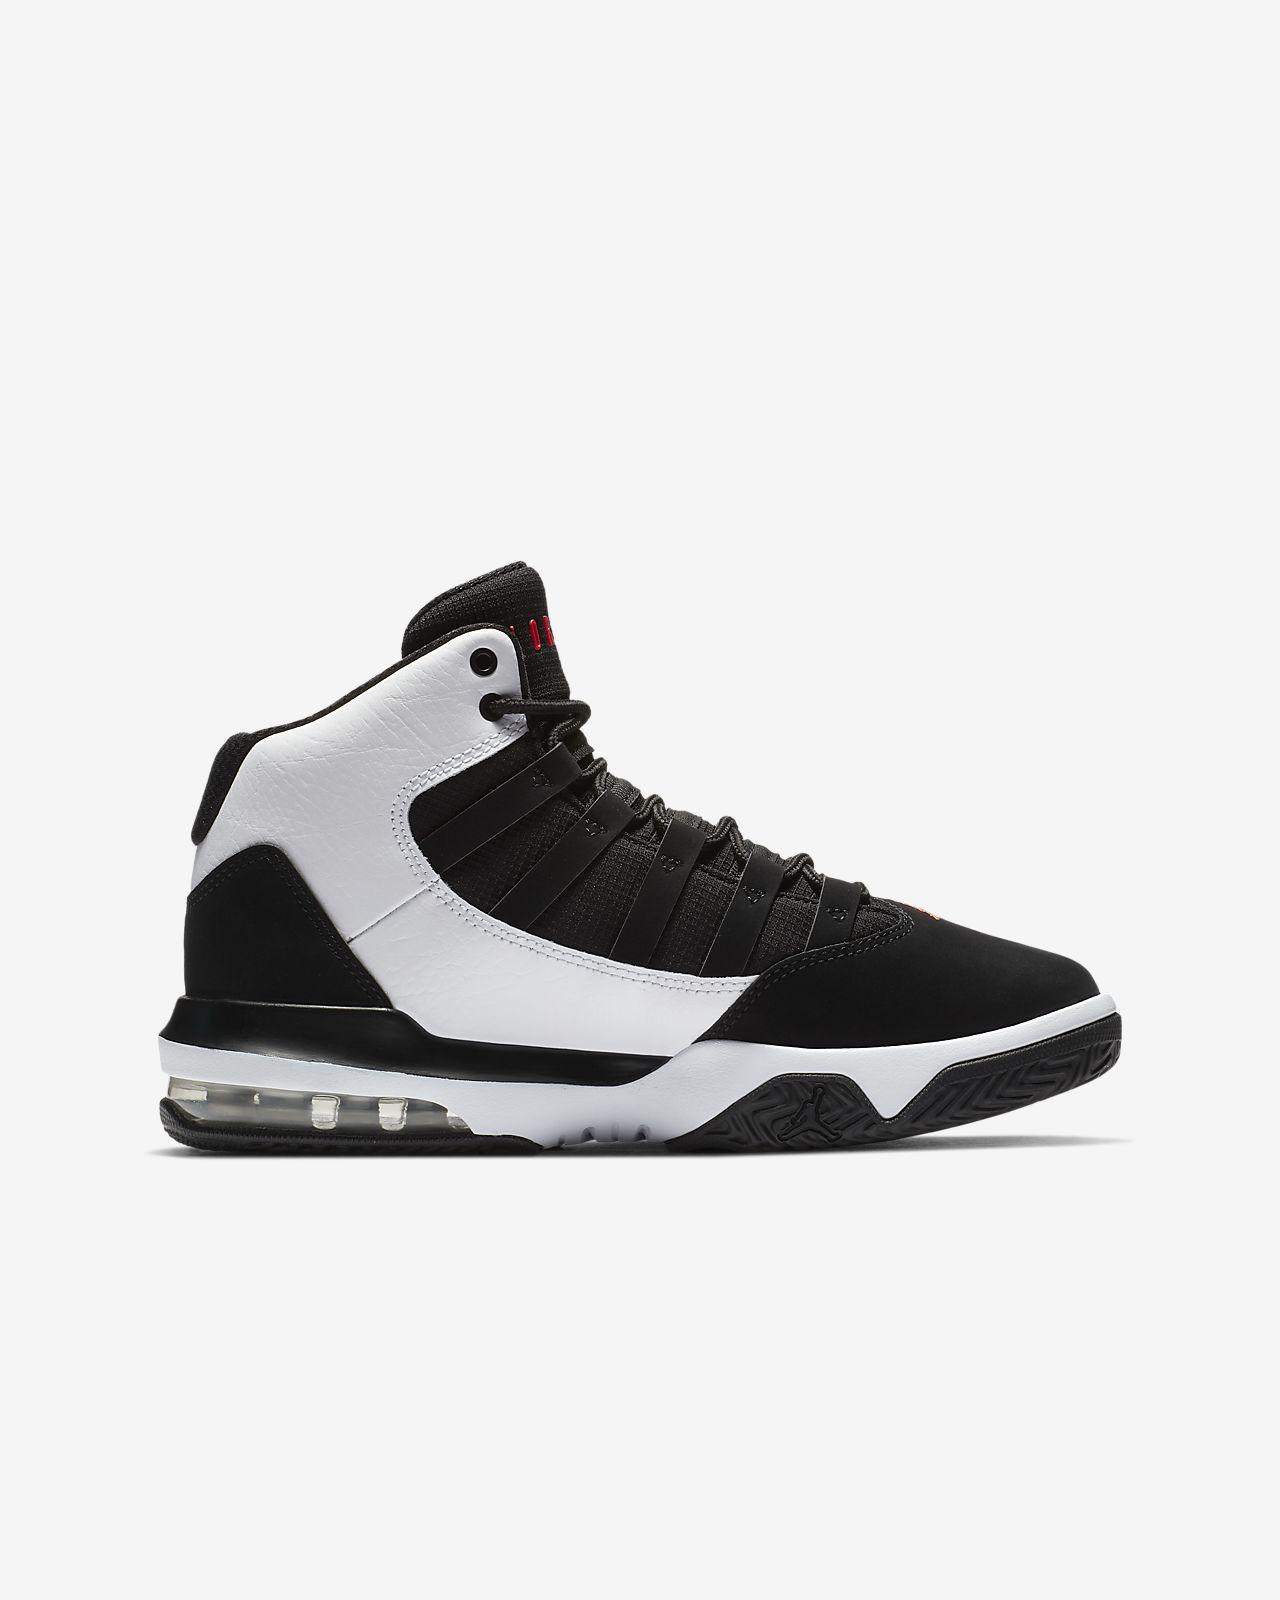 8086d6bde0e098 Jordan Max Aura Older Kids  Shoe. Nike.com GB